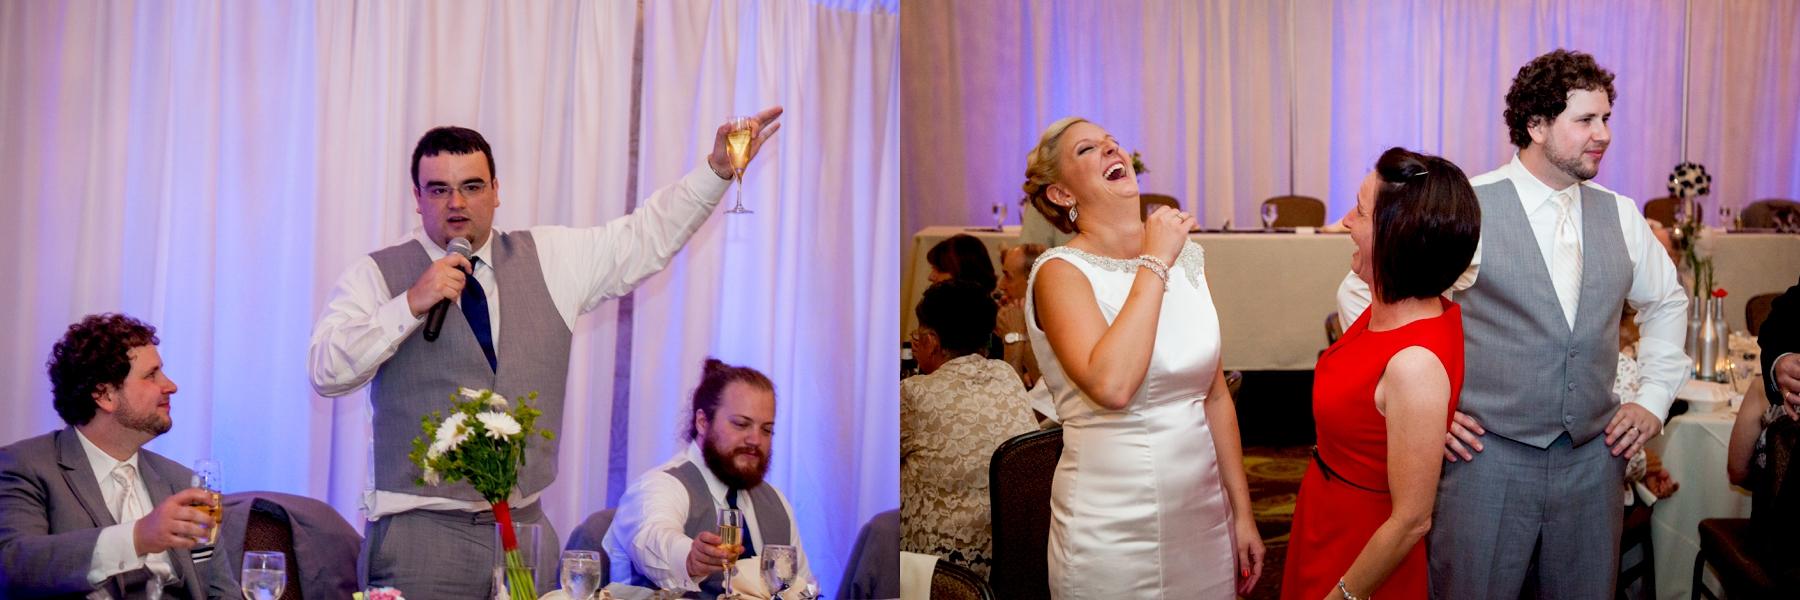 Brandon_Shafer_Photography_Chris_Lauren_Michigan_State_Capital_Wedding_0049.jpg